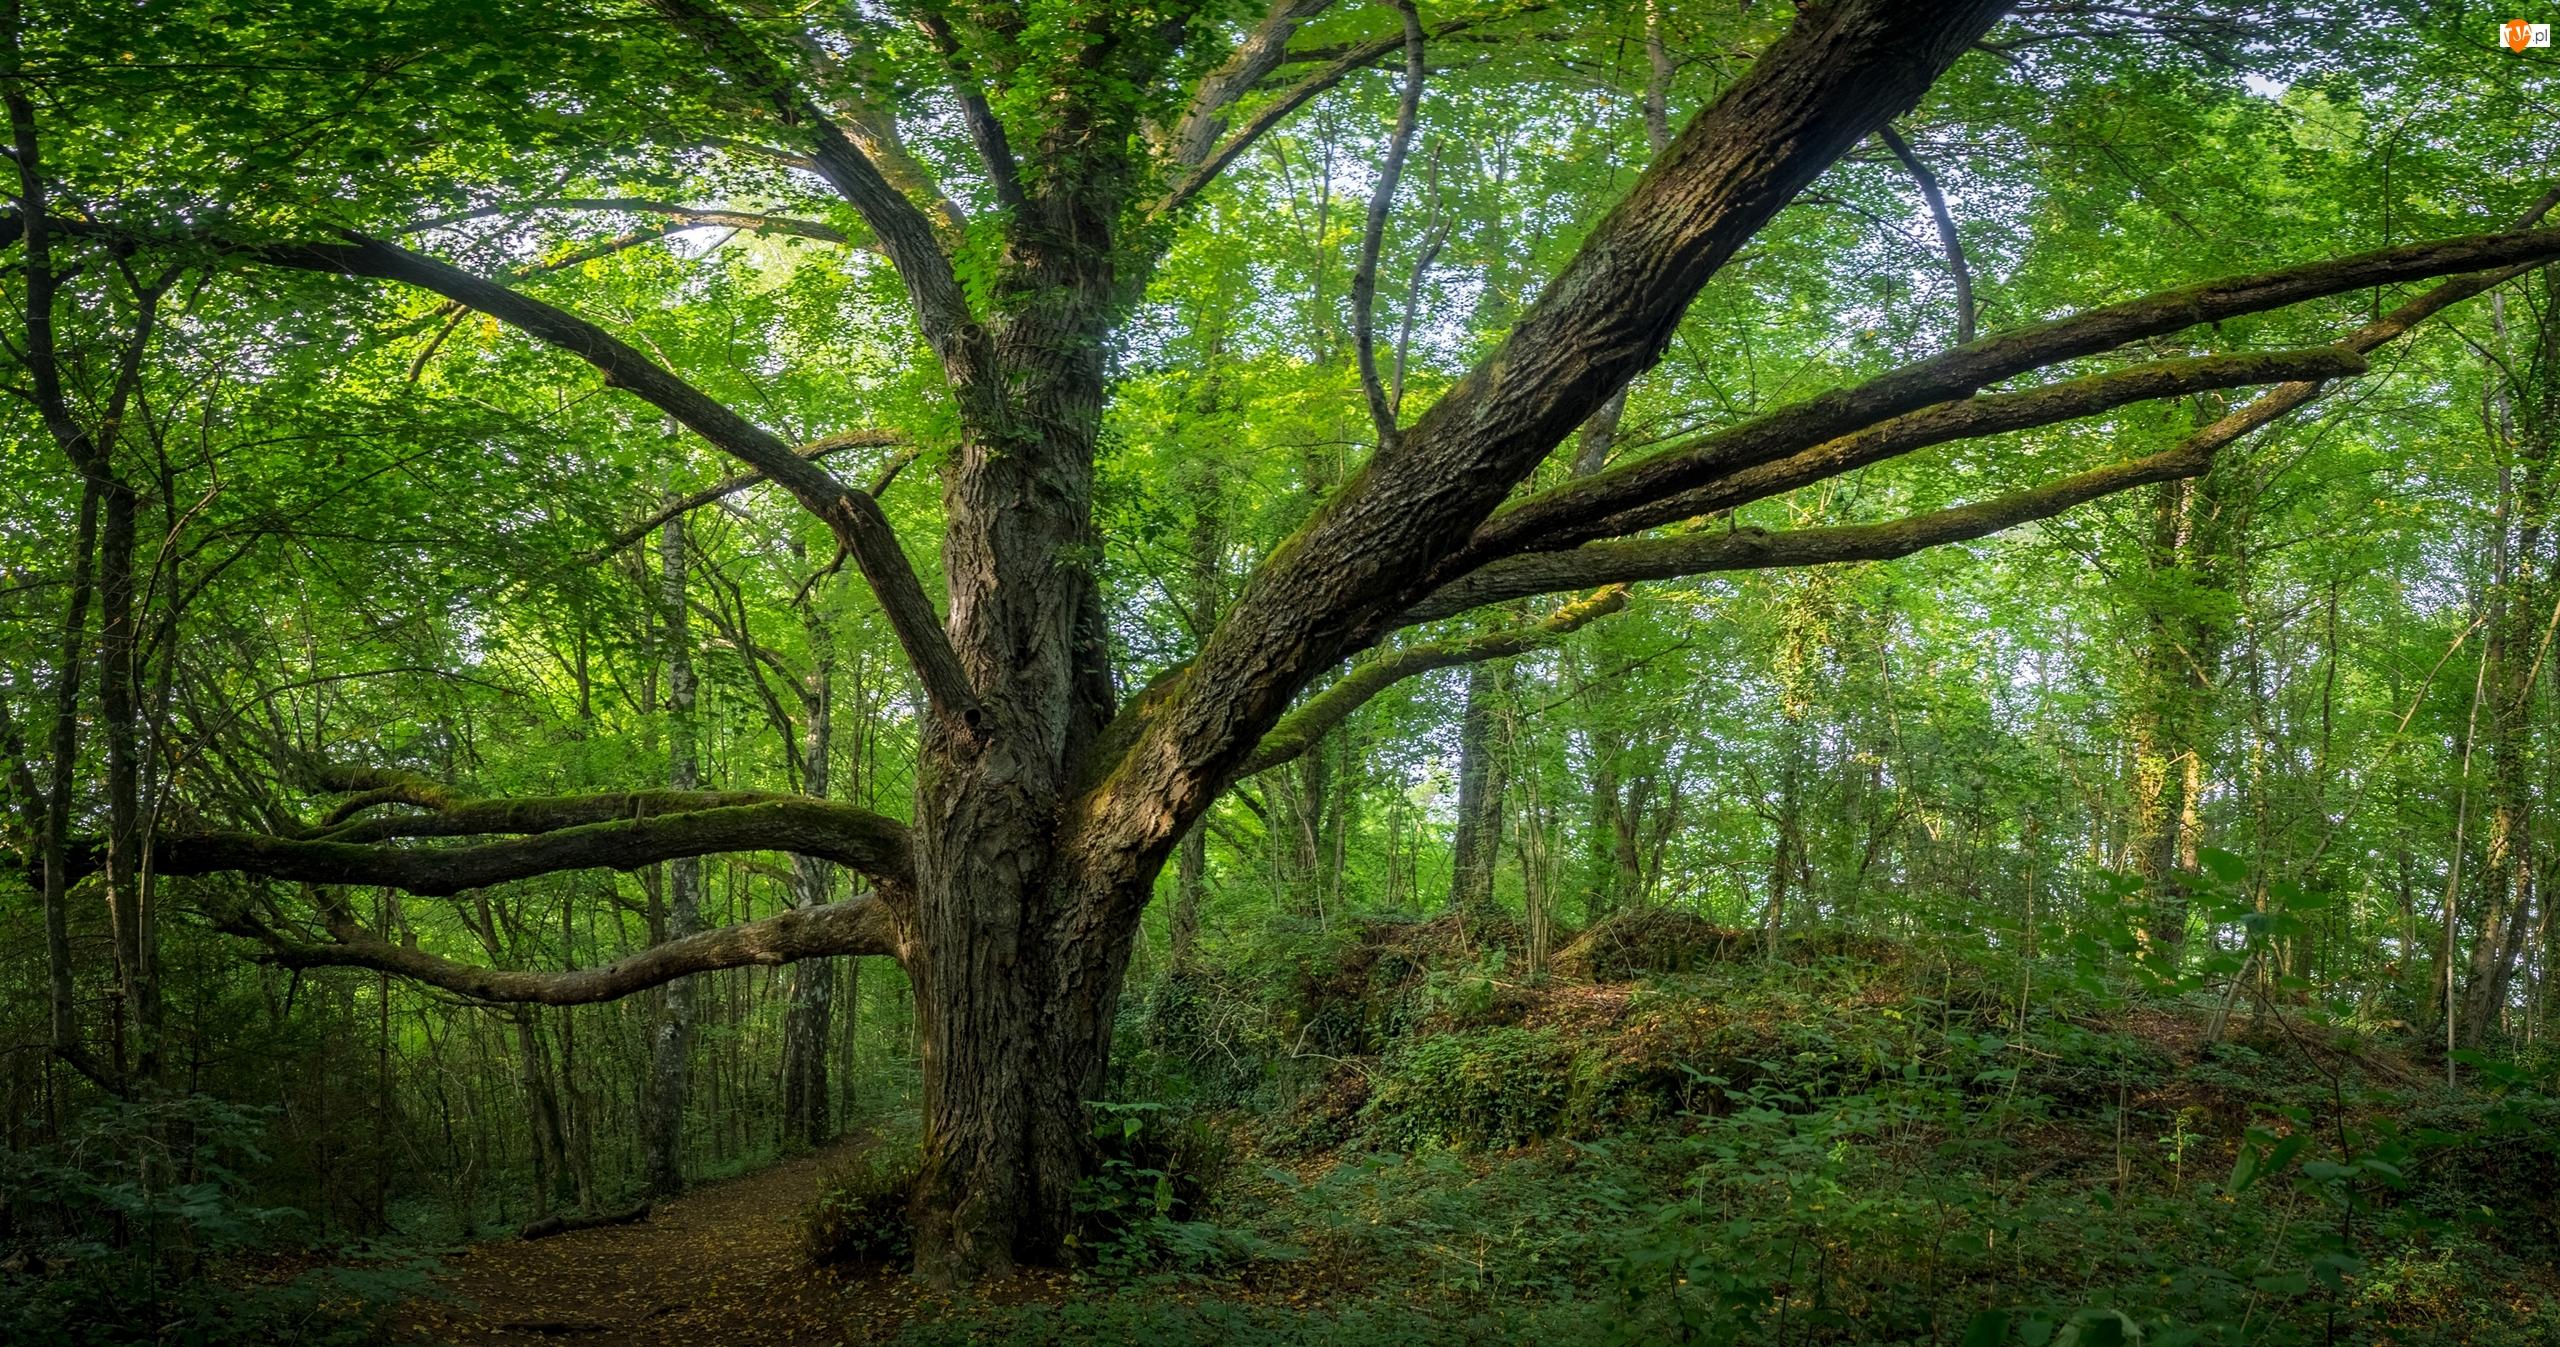 Ścieżka, Drzewo, Las